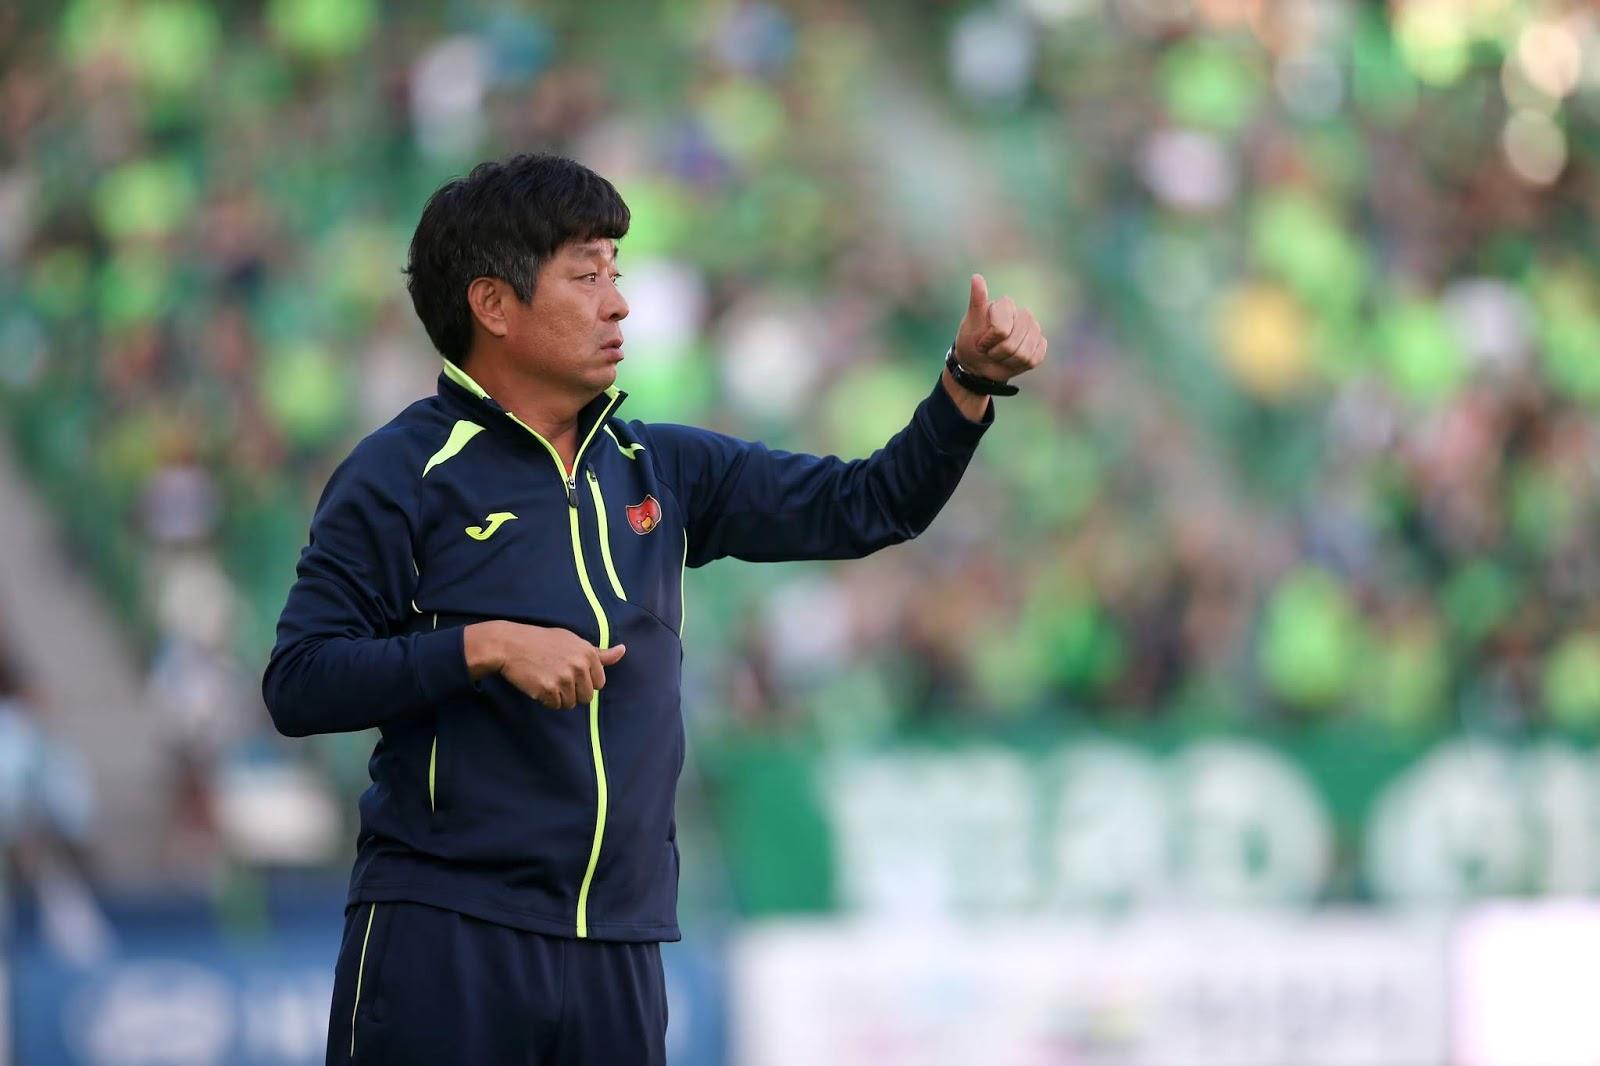 K League 1 Preview: Gangwon FC vs Pohang Steelers